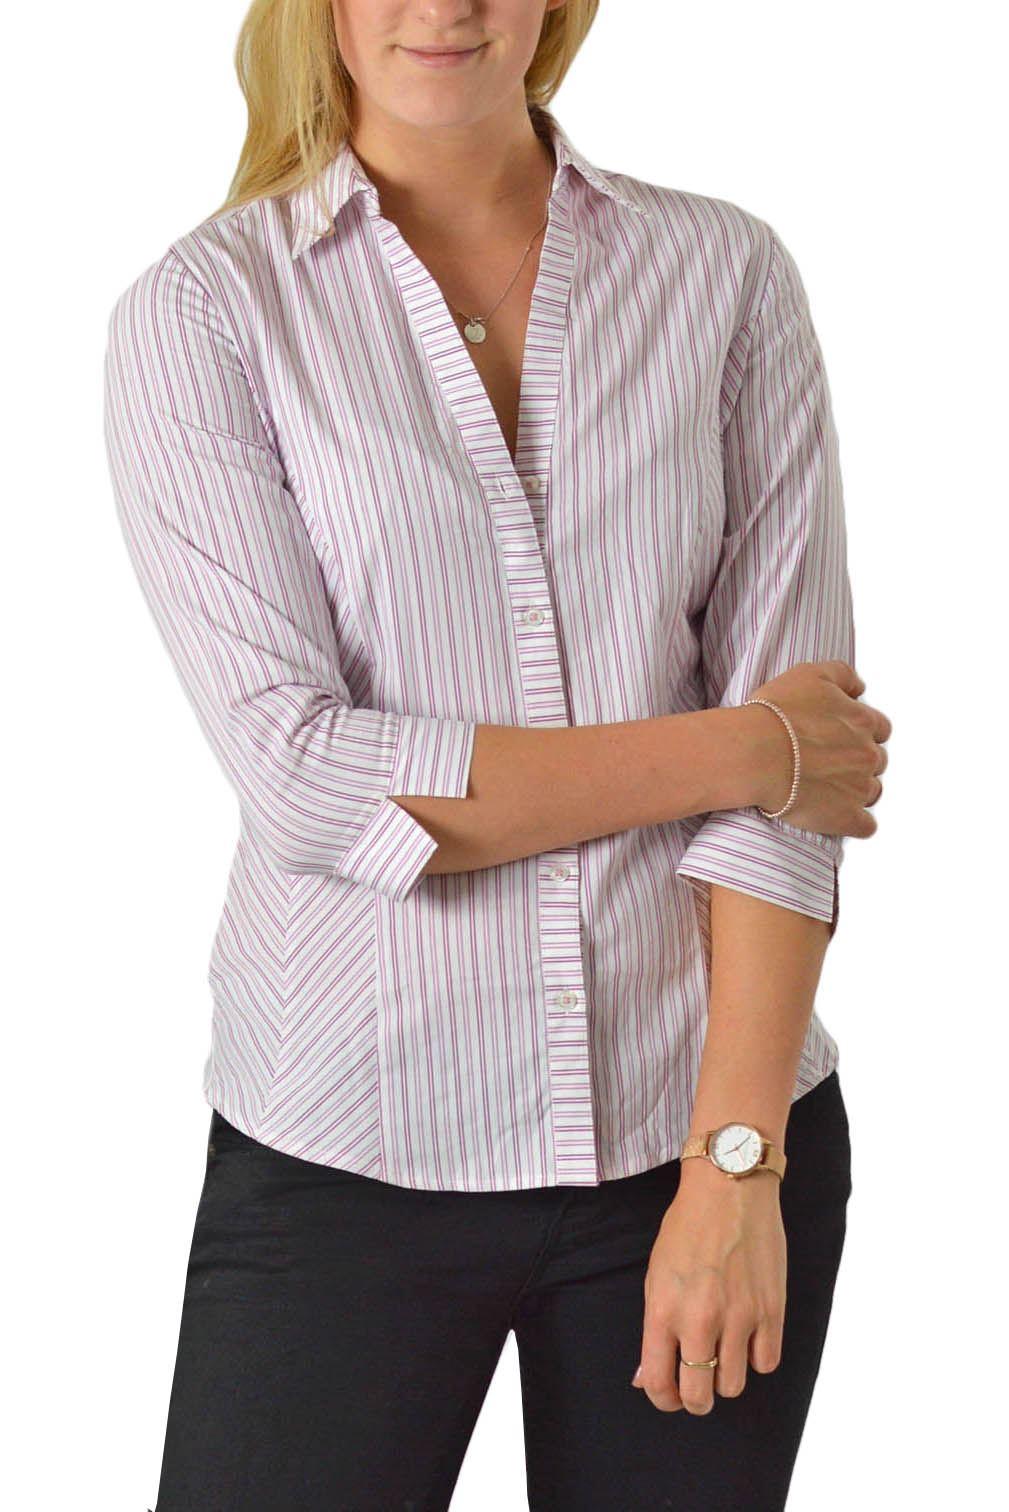 Ex-M-amp-S-Camisa-a-Rayas-Damas-Camisa-Marks-y-Spencer-Tuck-Frontal-Superior-Tallas-8-24 miniatura 8